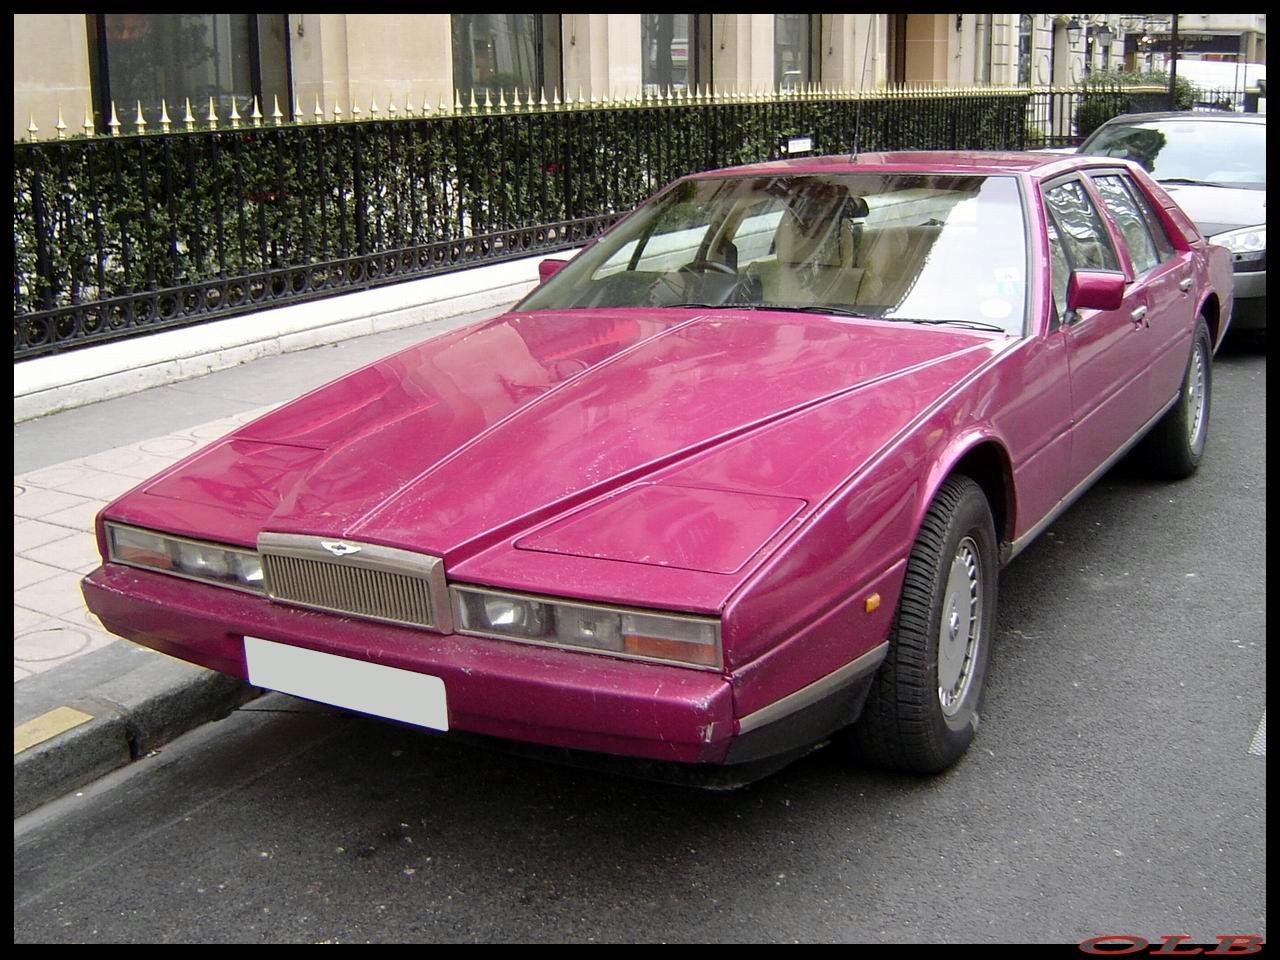 S0-La-photo-du-jour-Aston-Martin-Lagonda-52497